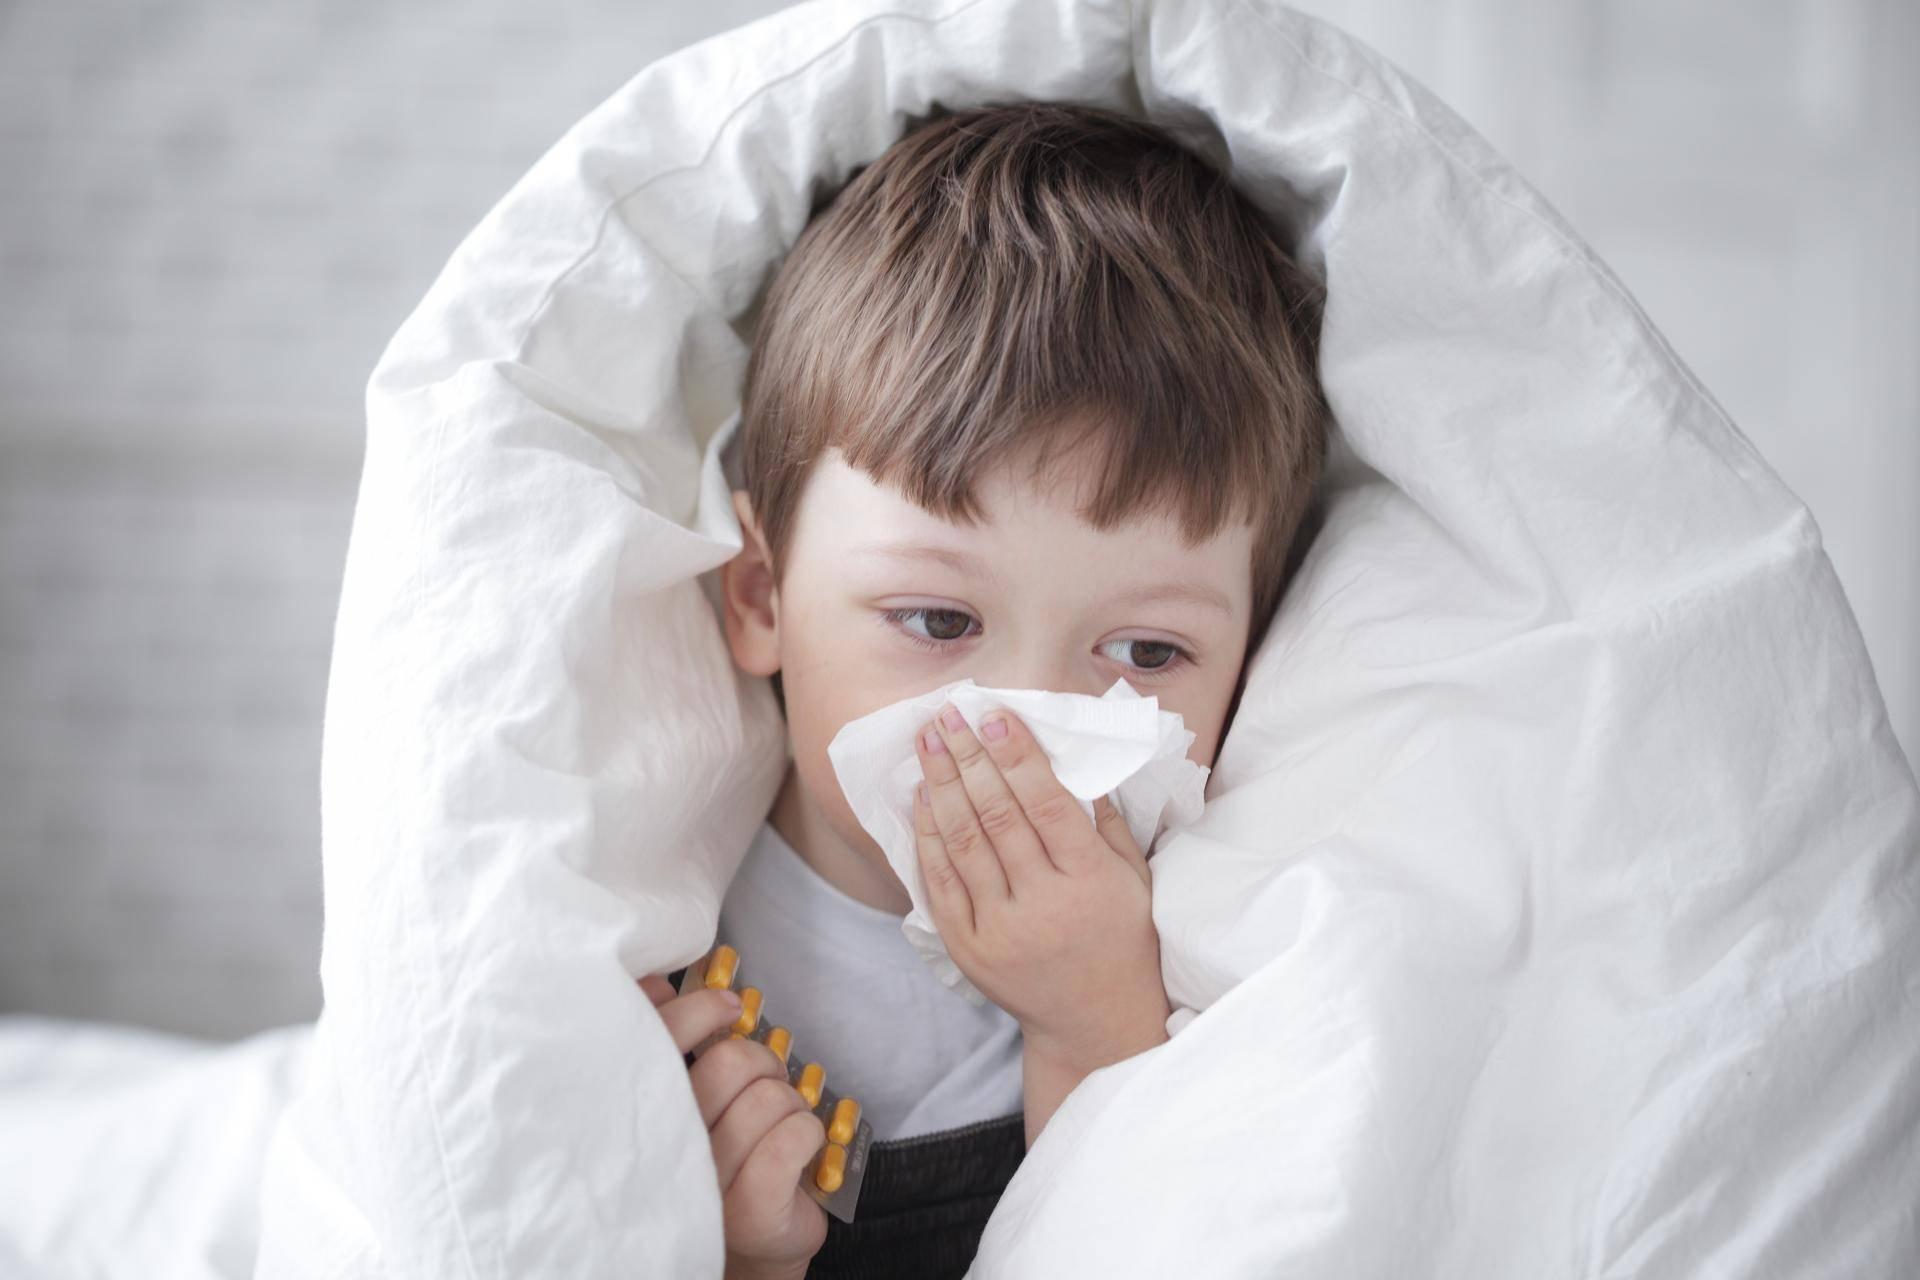 Причины кашля и насморка без температуры у ребенка